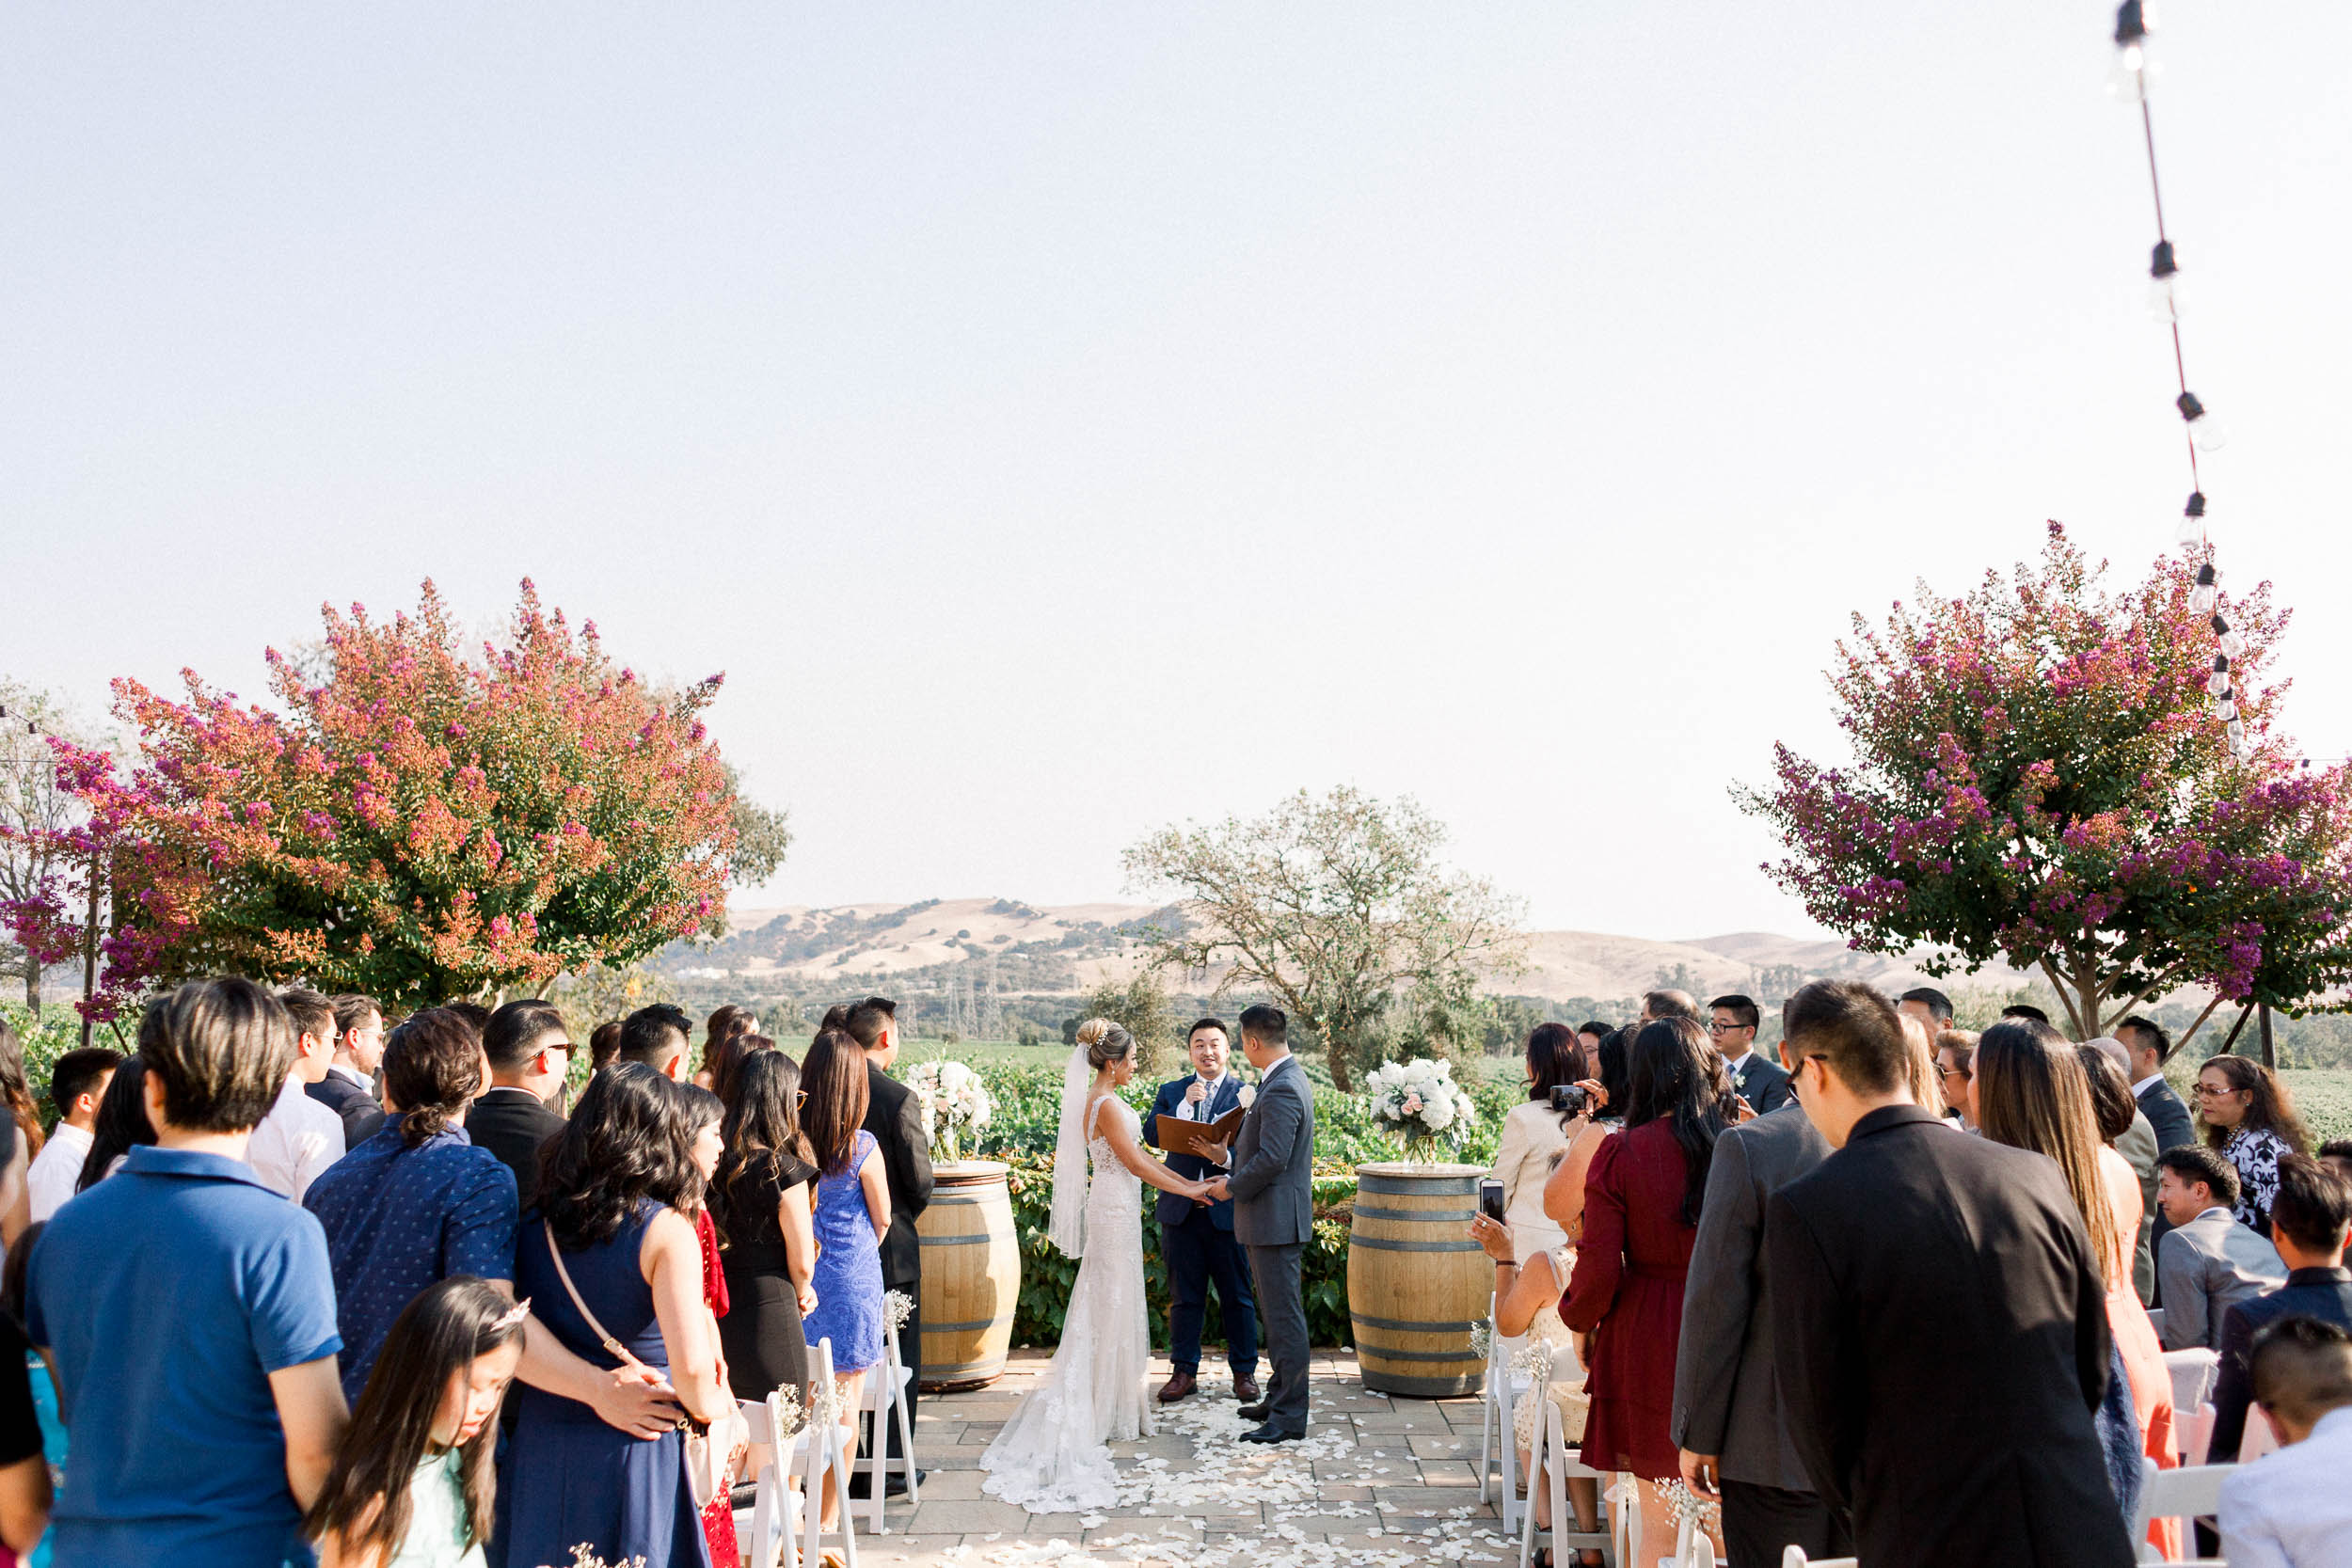 Las Positas Wedding_Buena Lane Photography_090118ER409.jpg